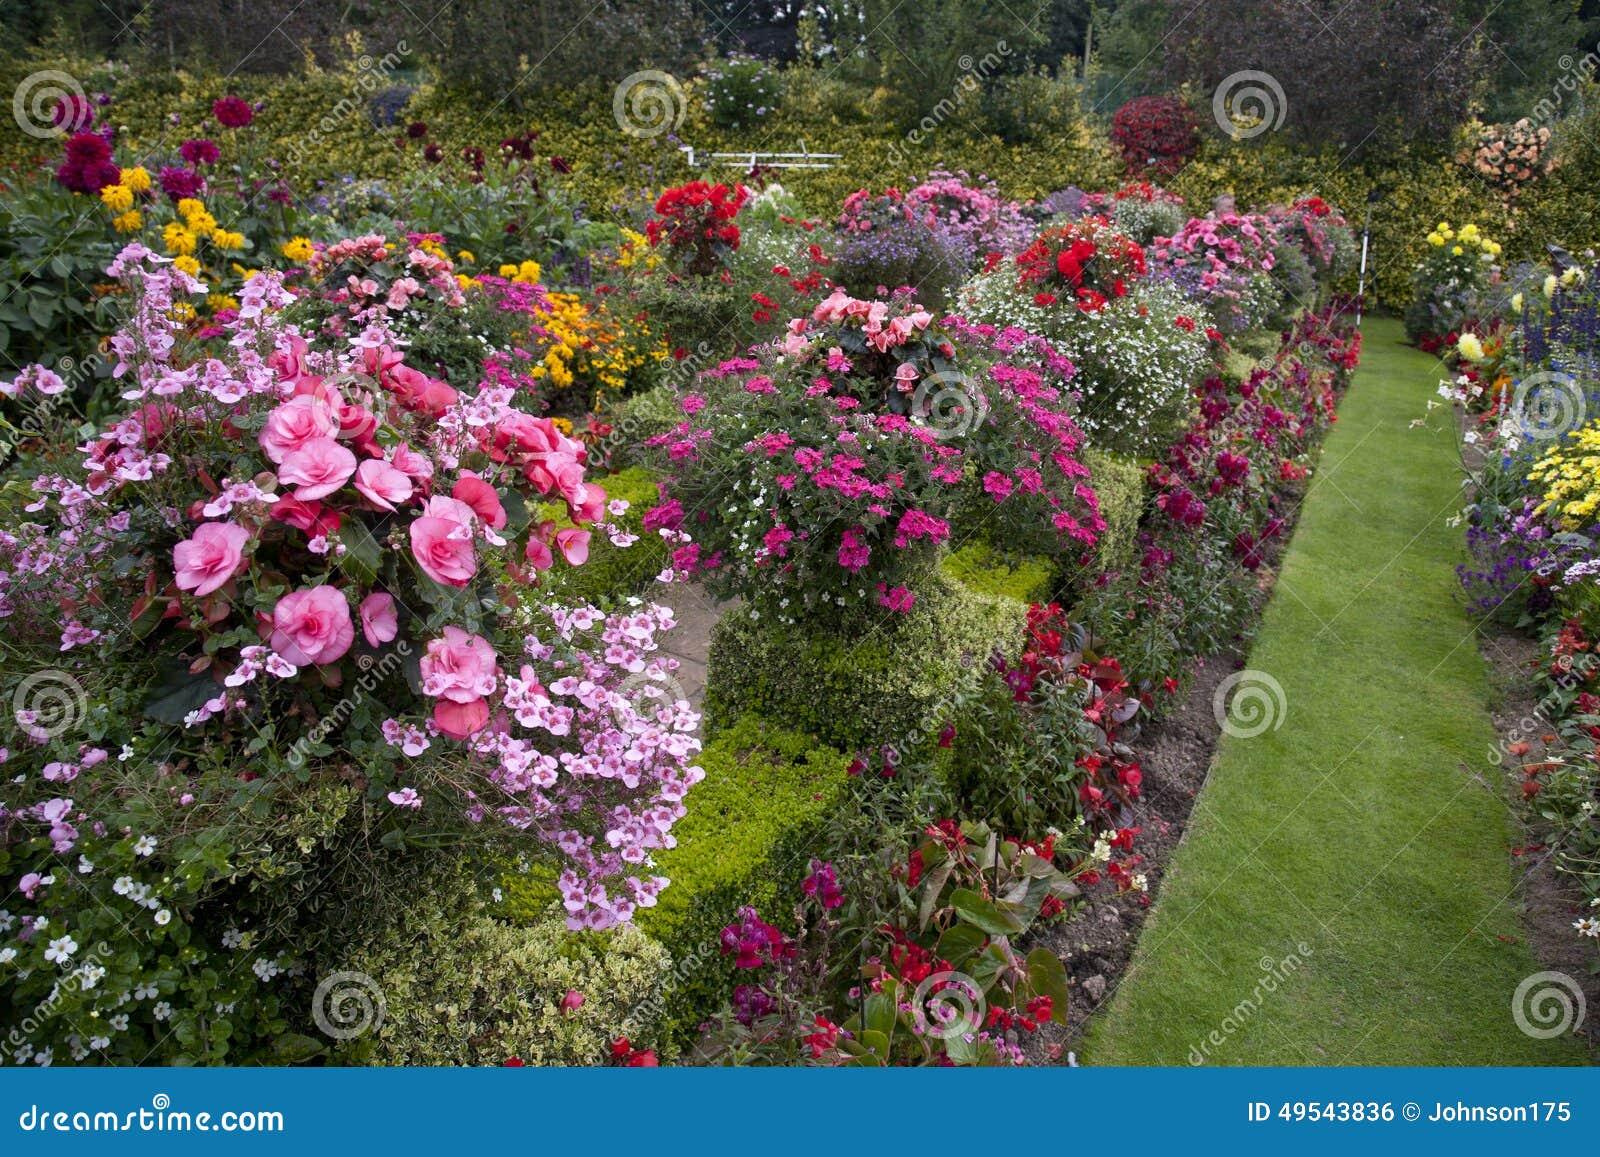 Bright & Colourful Garden